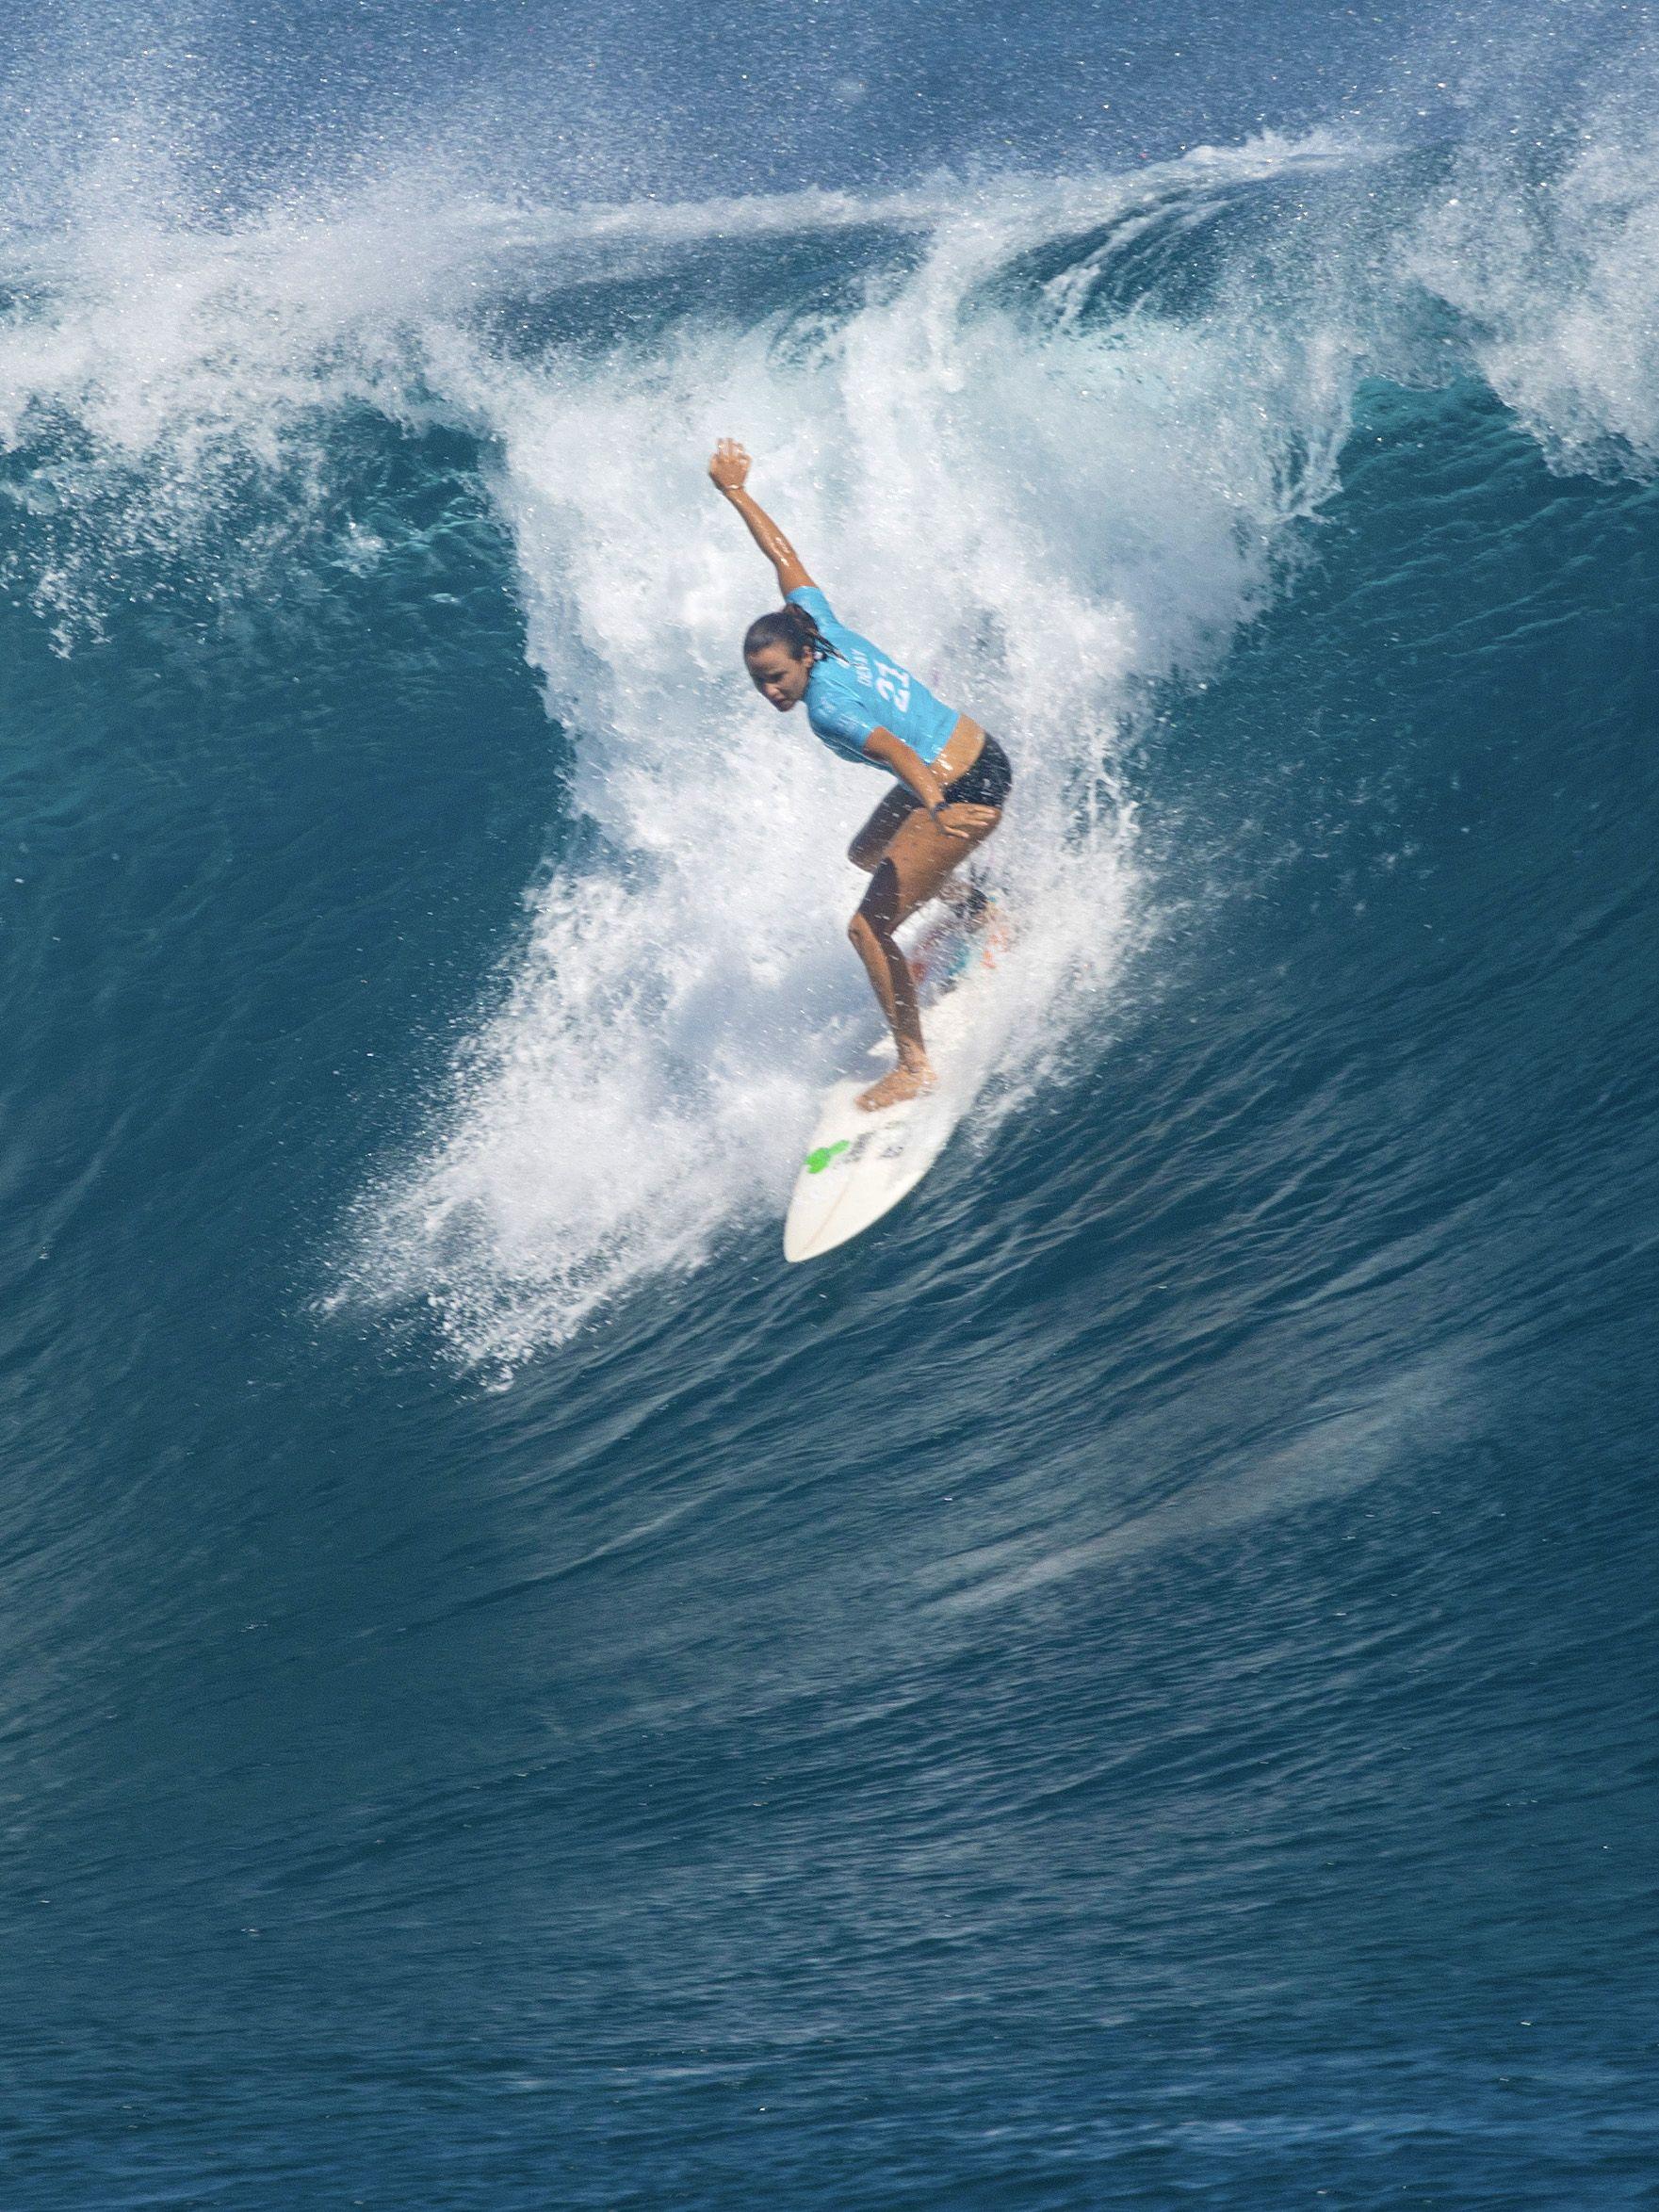 Johanne Defay in Round 1 #FijiPro